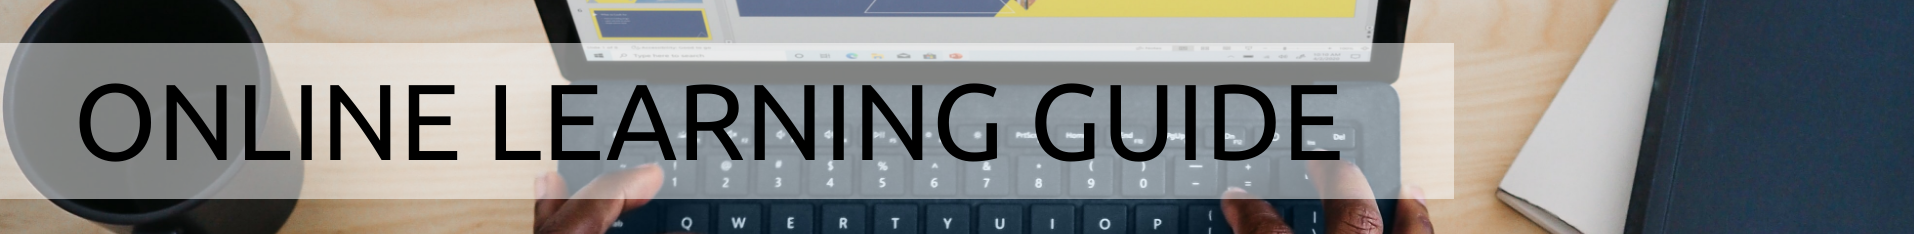 Online Learning Guide banner